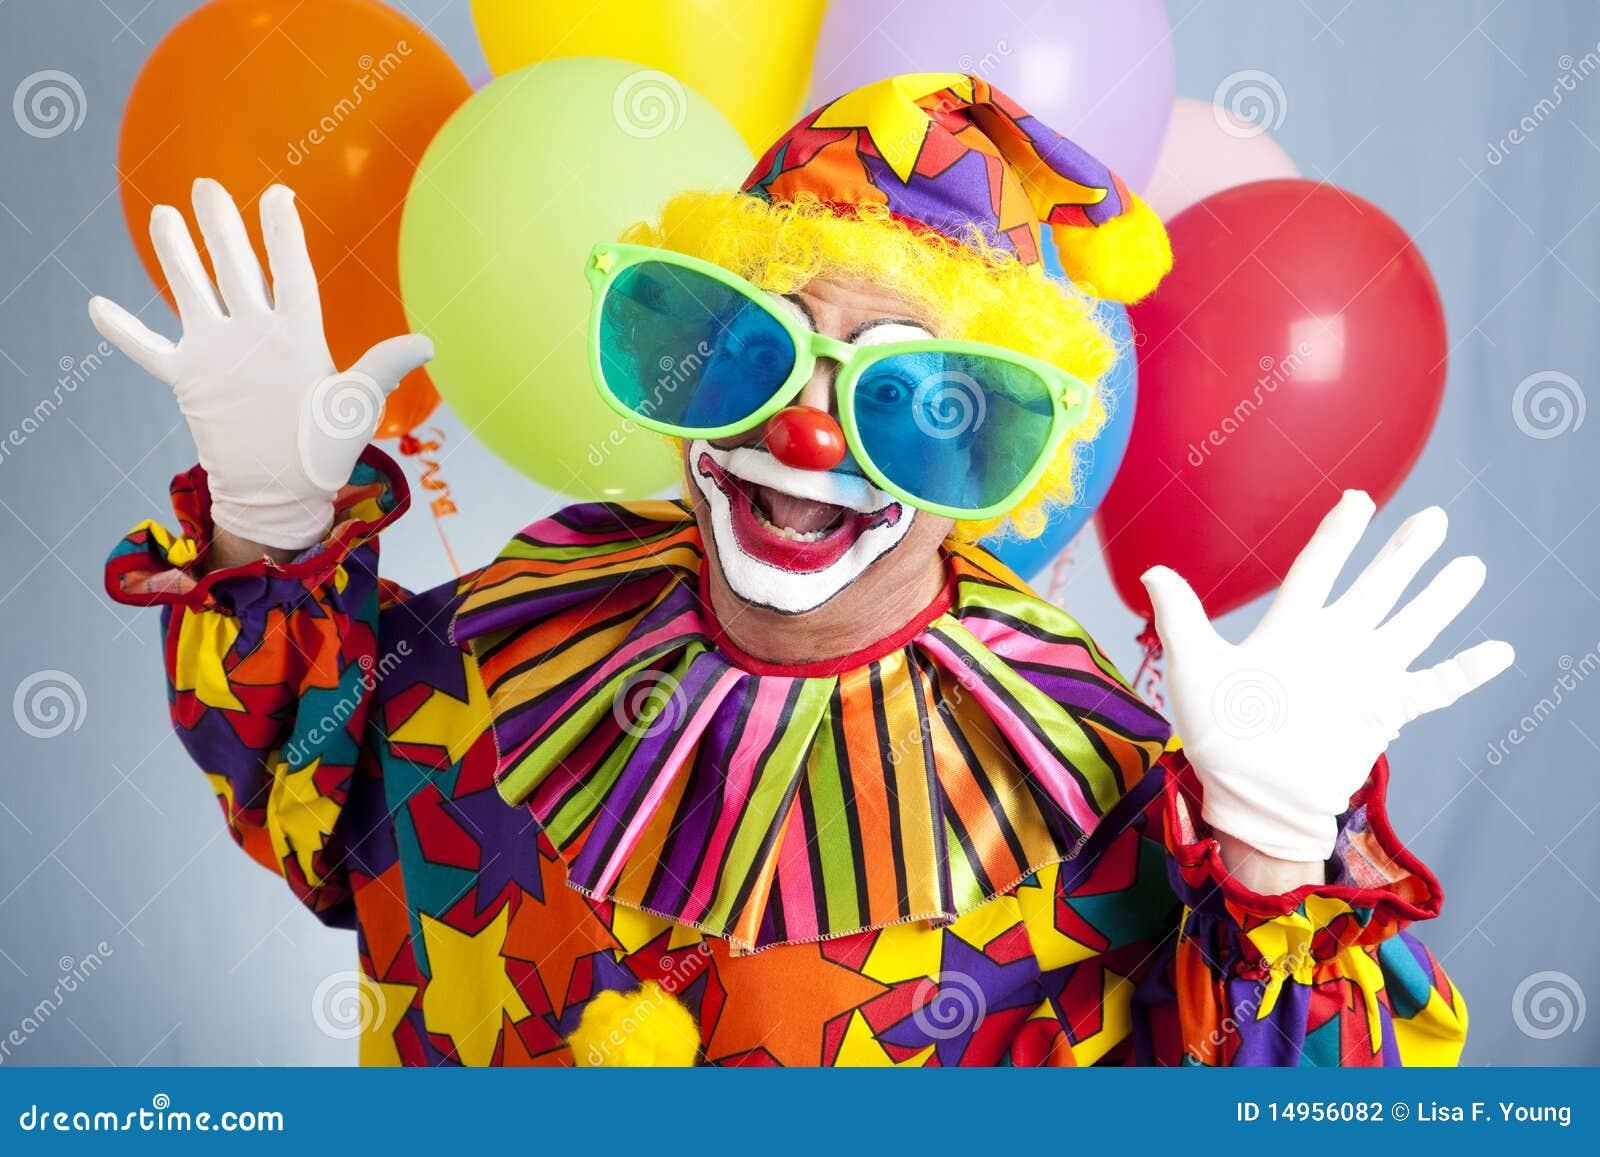 Grappige Clown in Grote Glazen